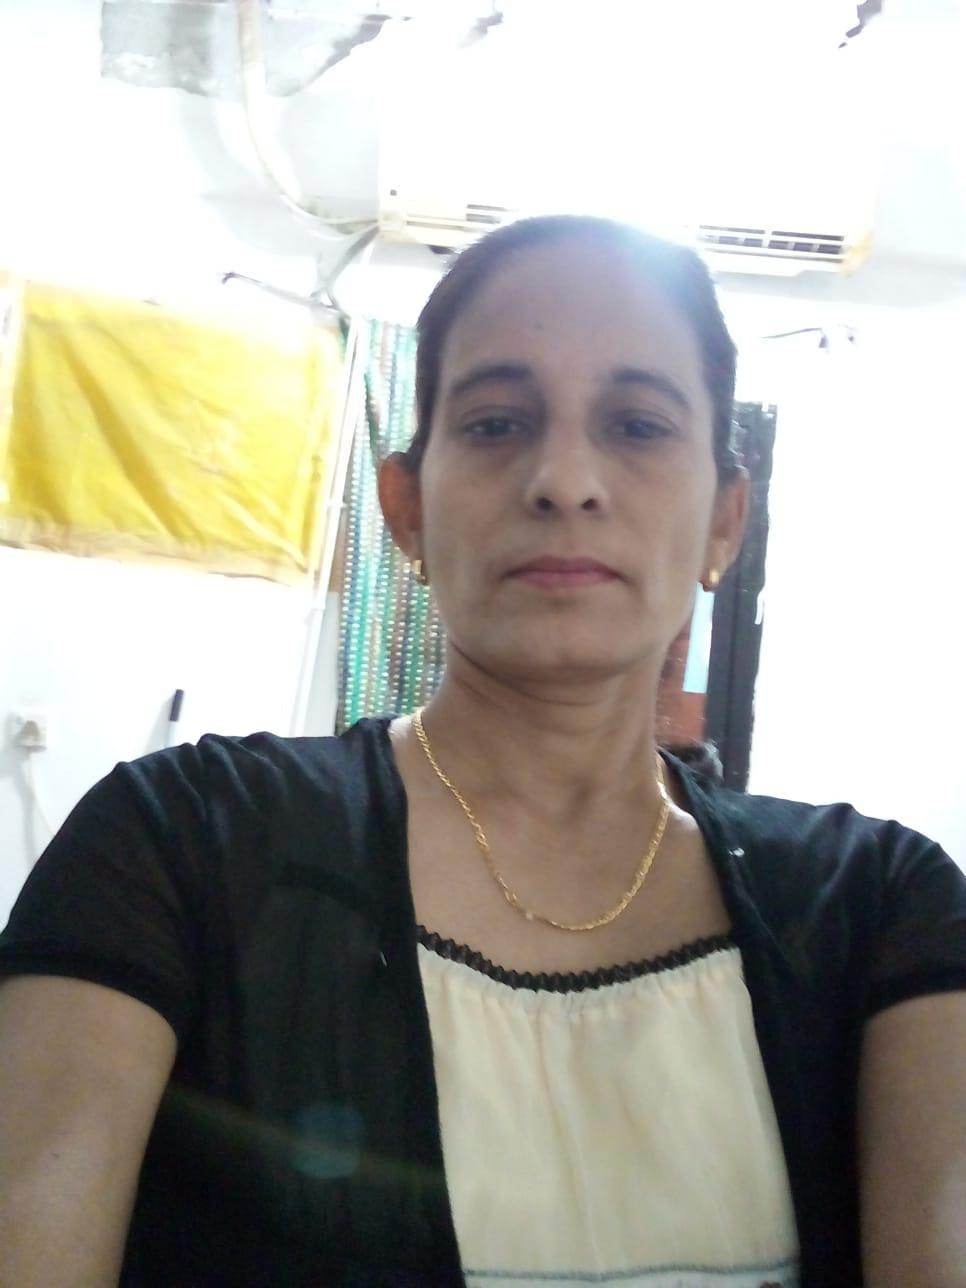 mahamarakkalage  krishsnthi priyadarshika  perera photo_IM_2021092703103052.jpg